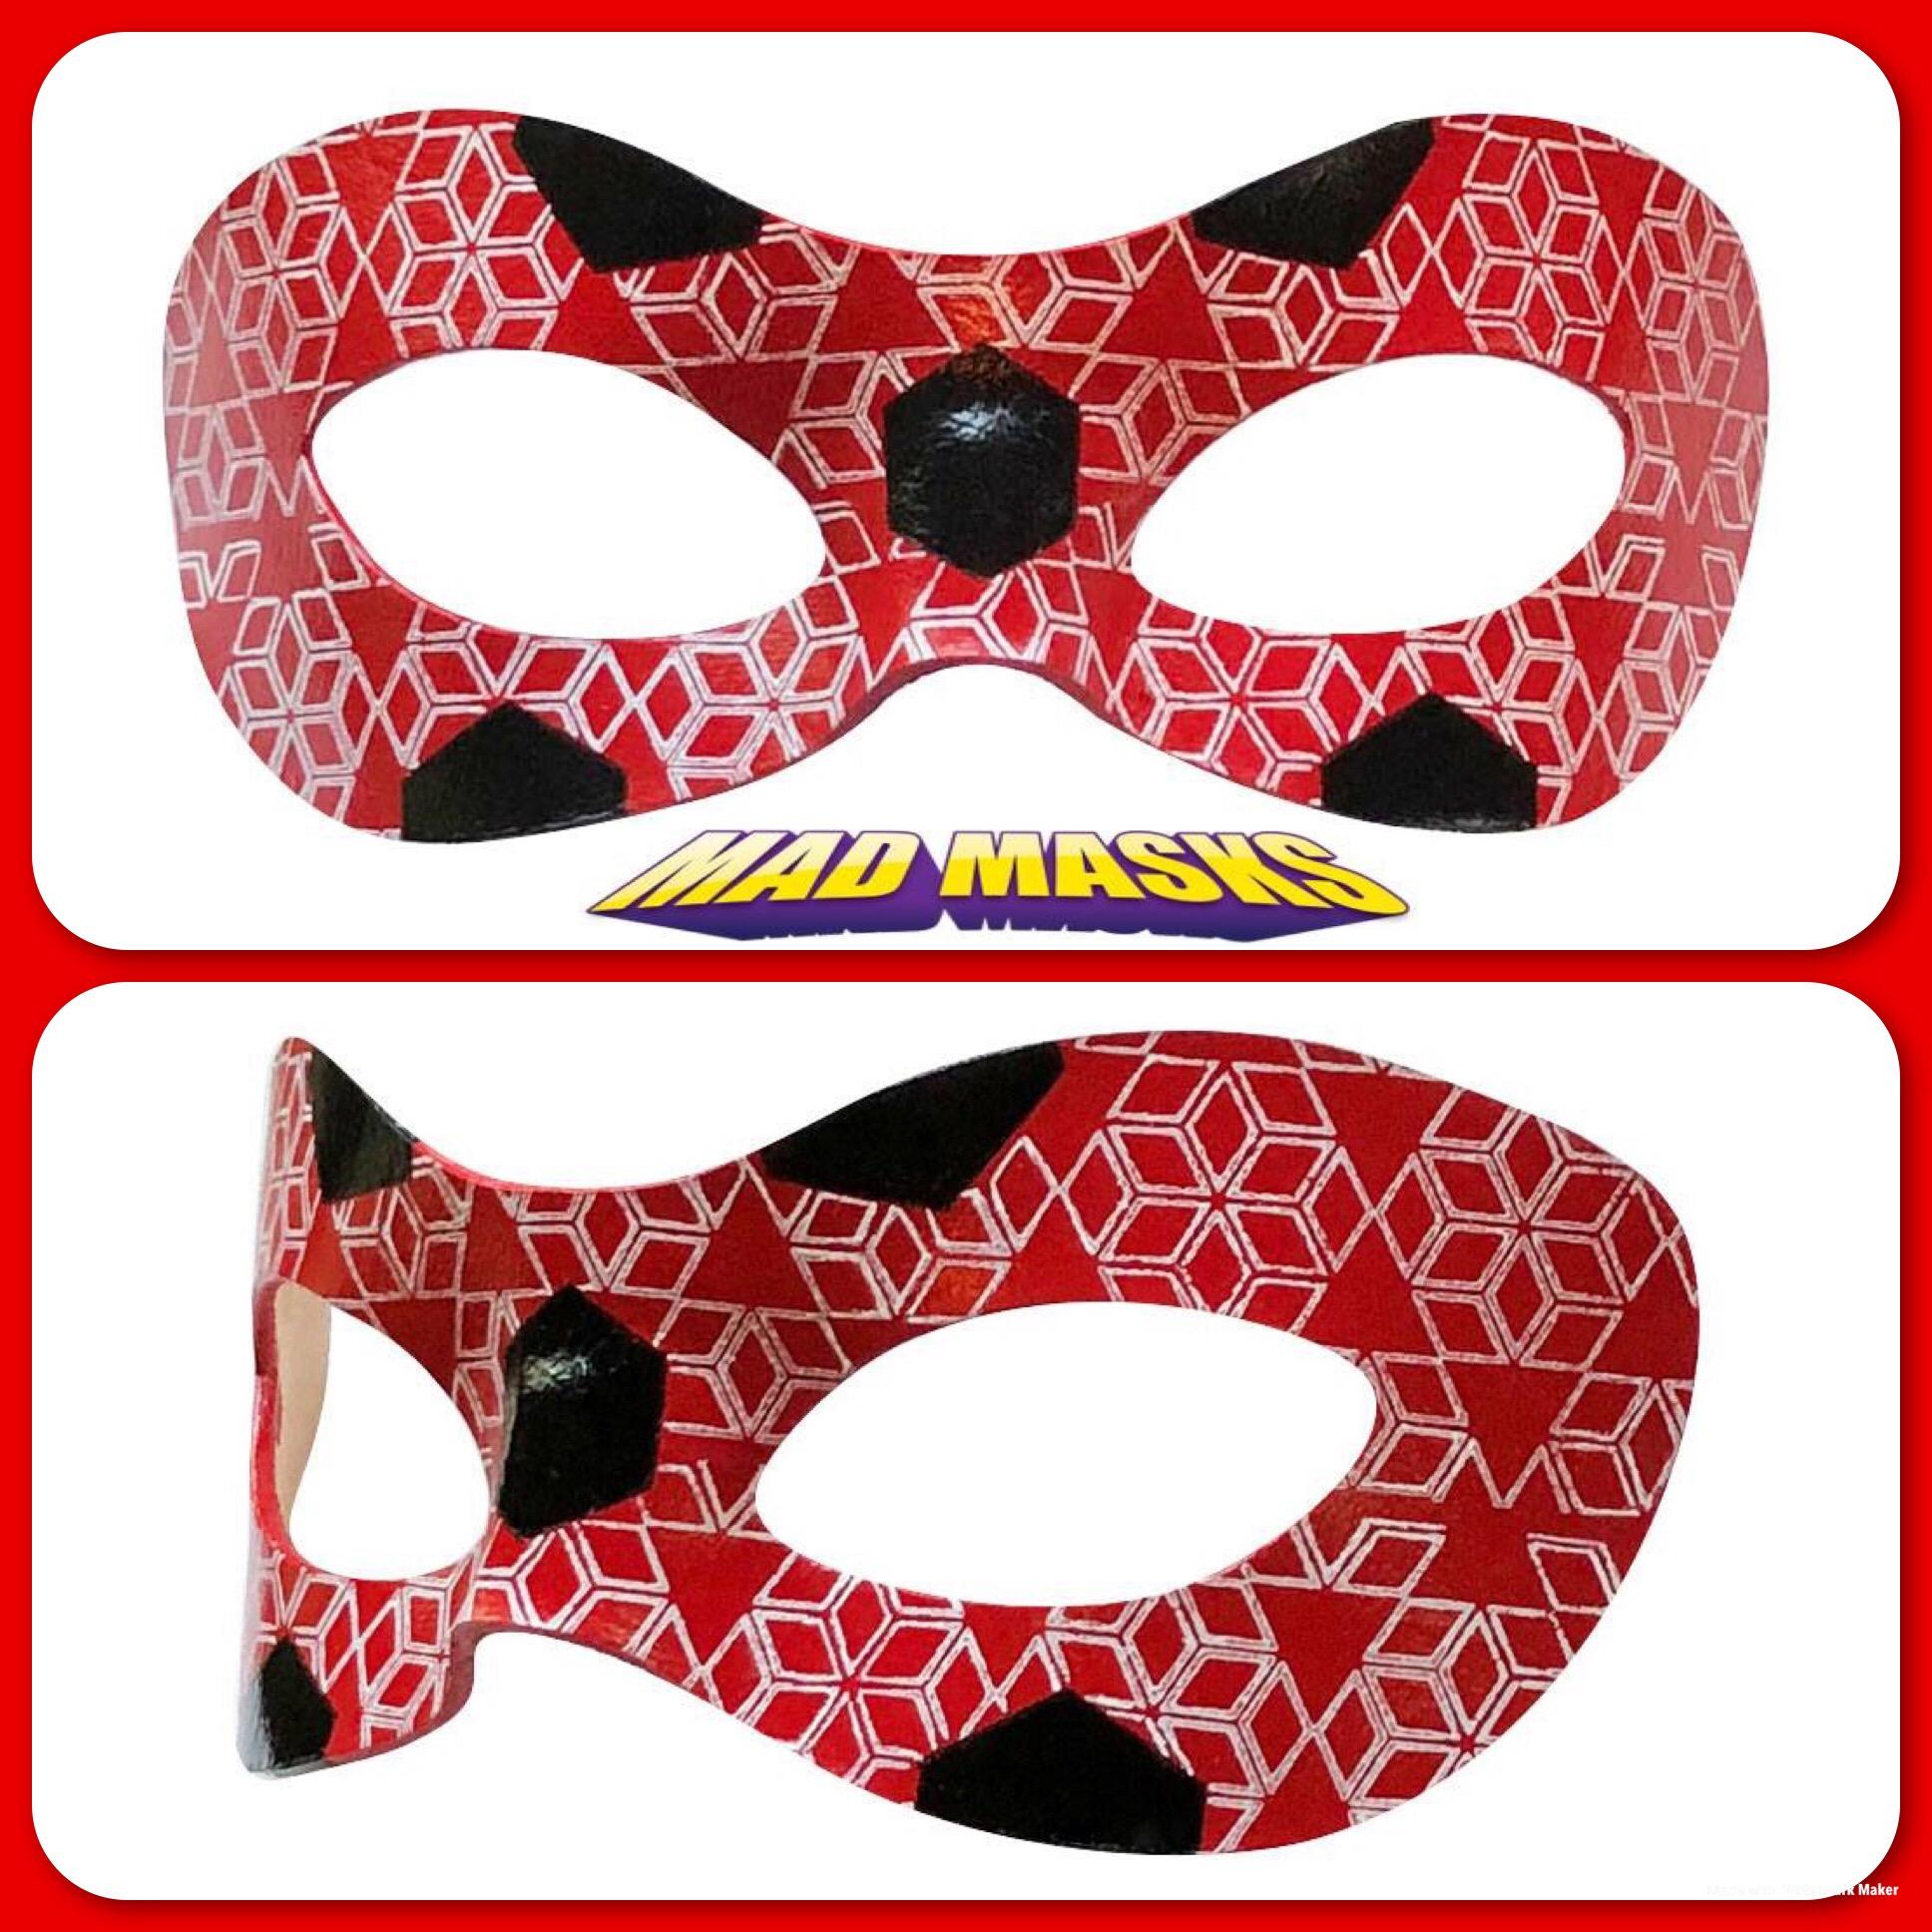 ice-ladybug-mask.jpg